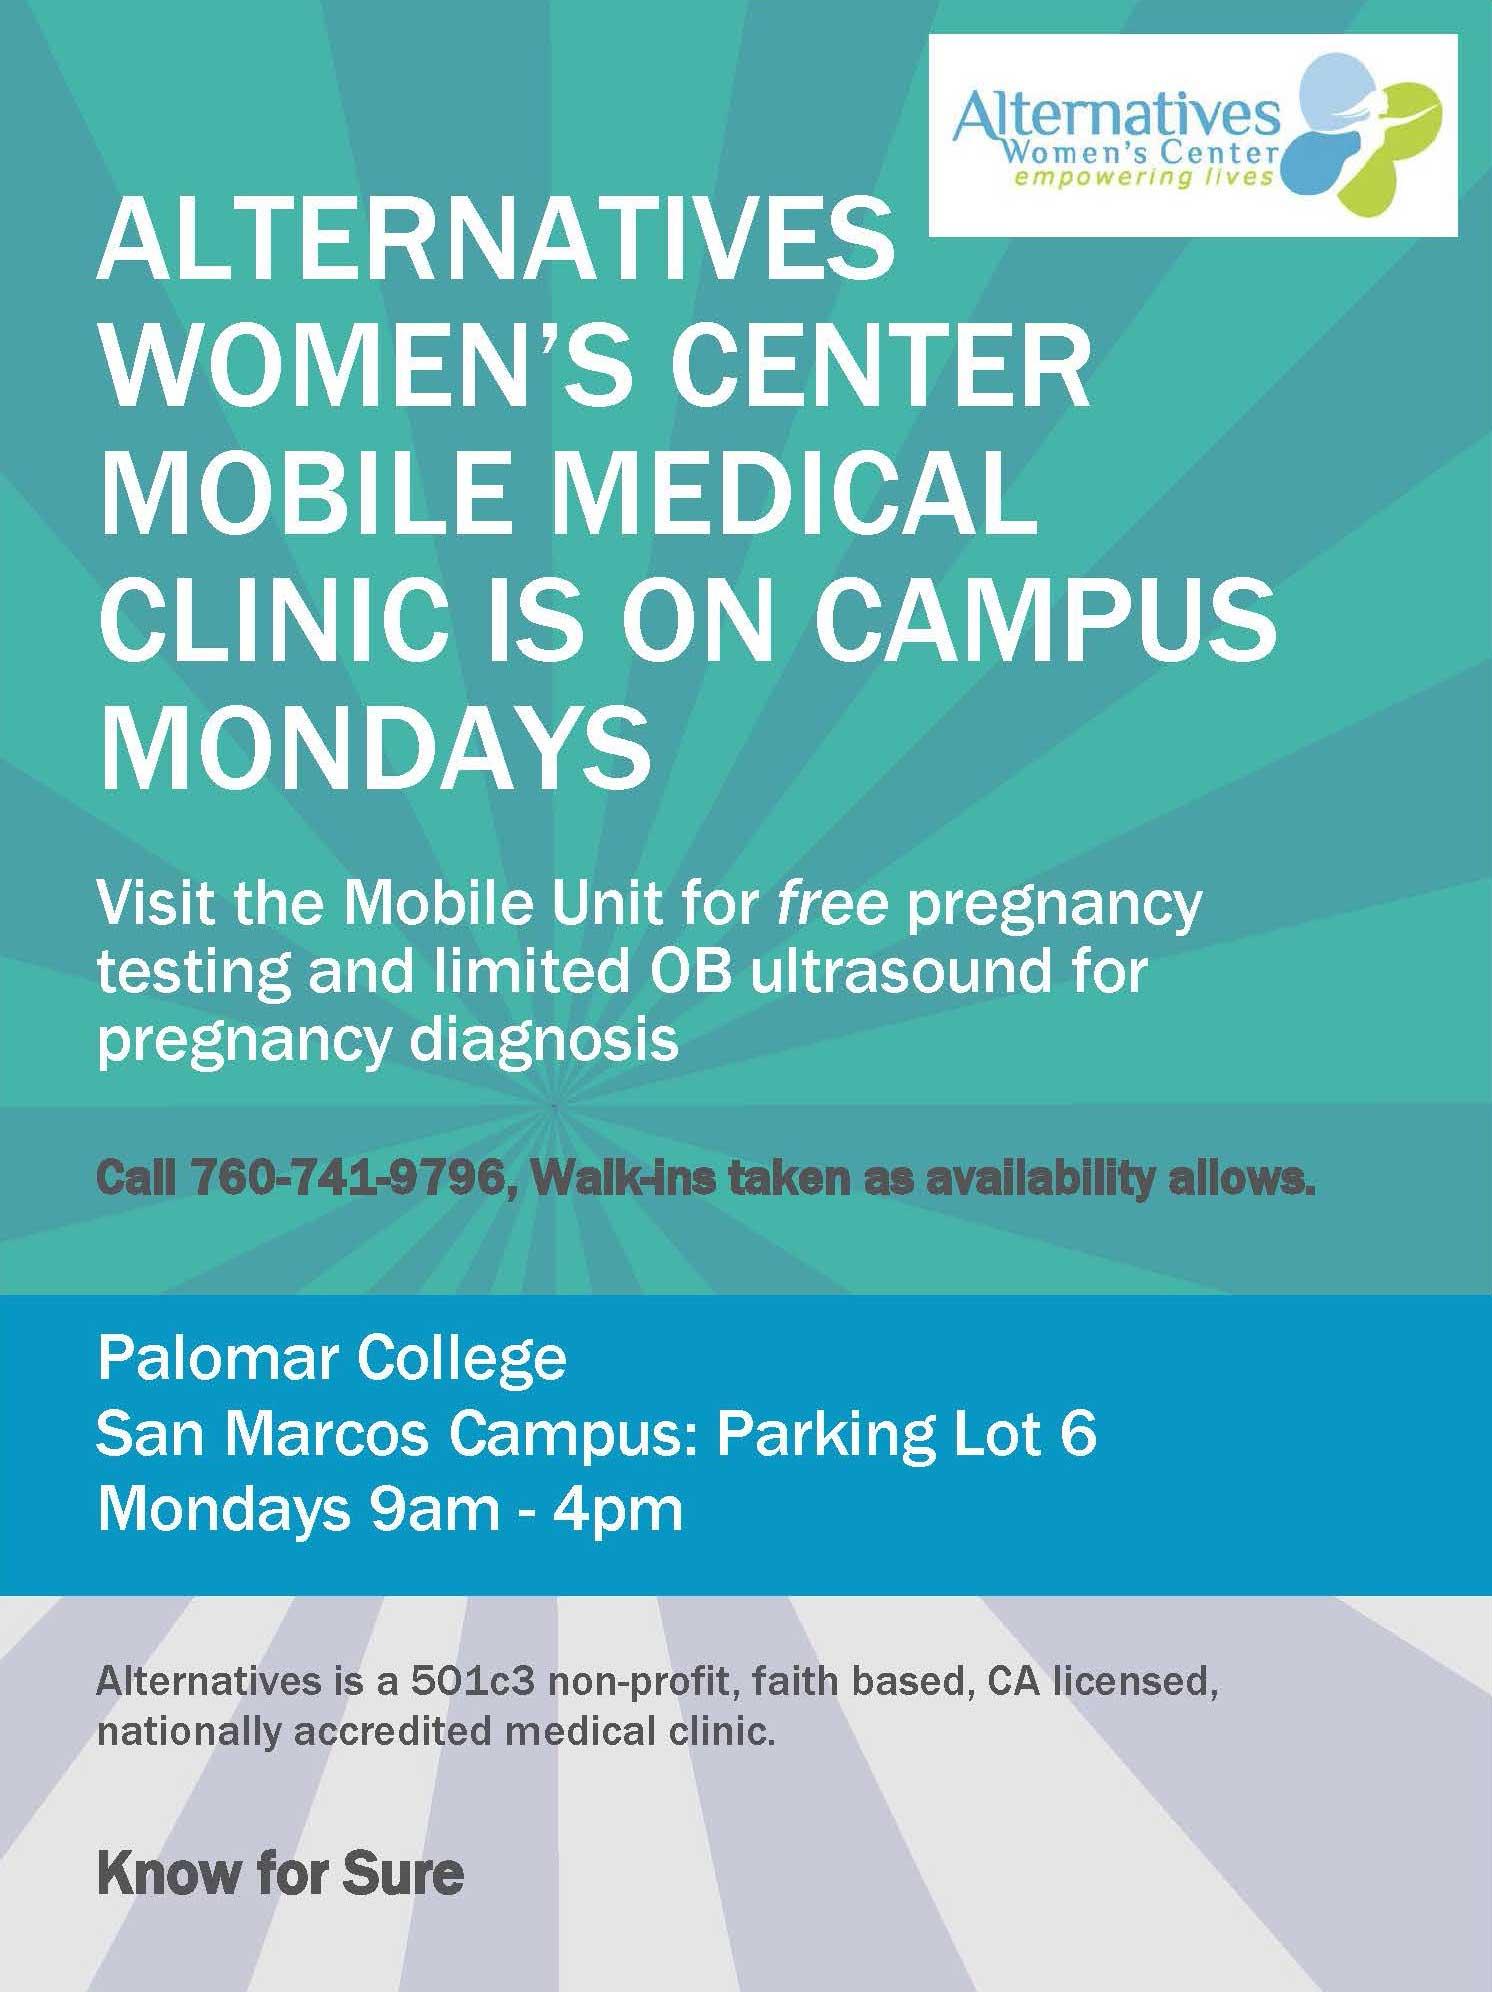 Free Pregnancy Testing on Mondays